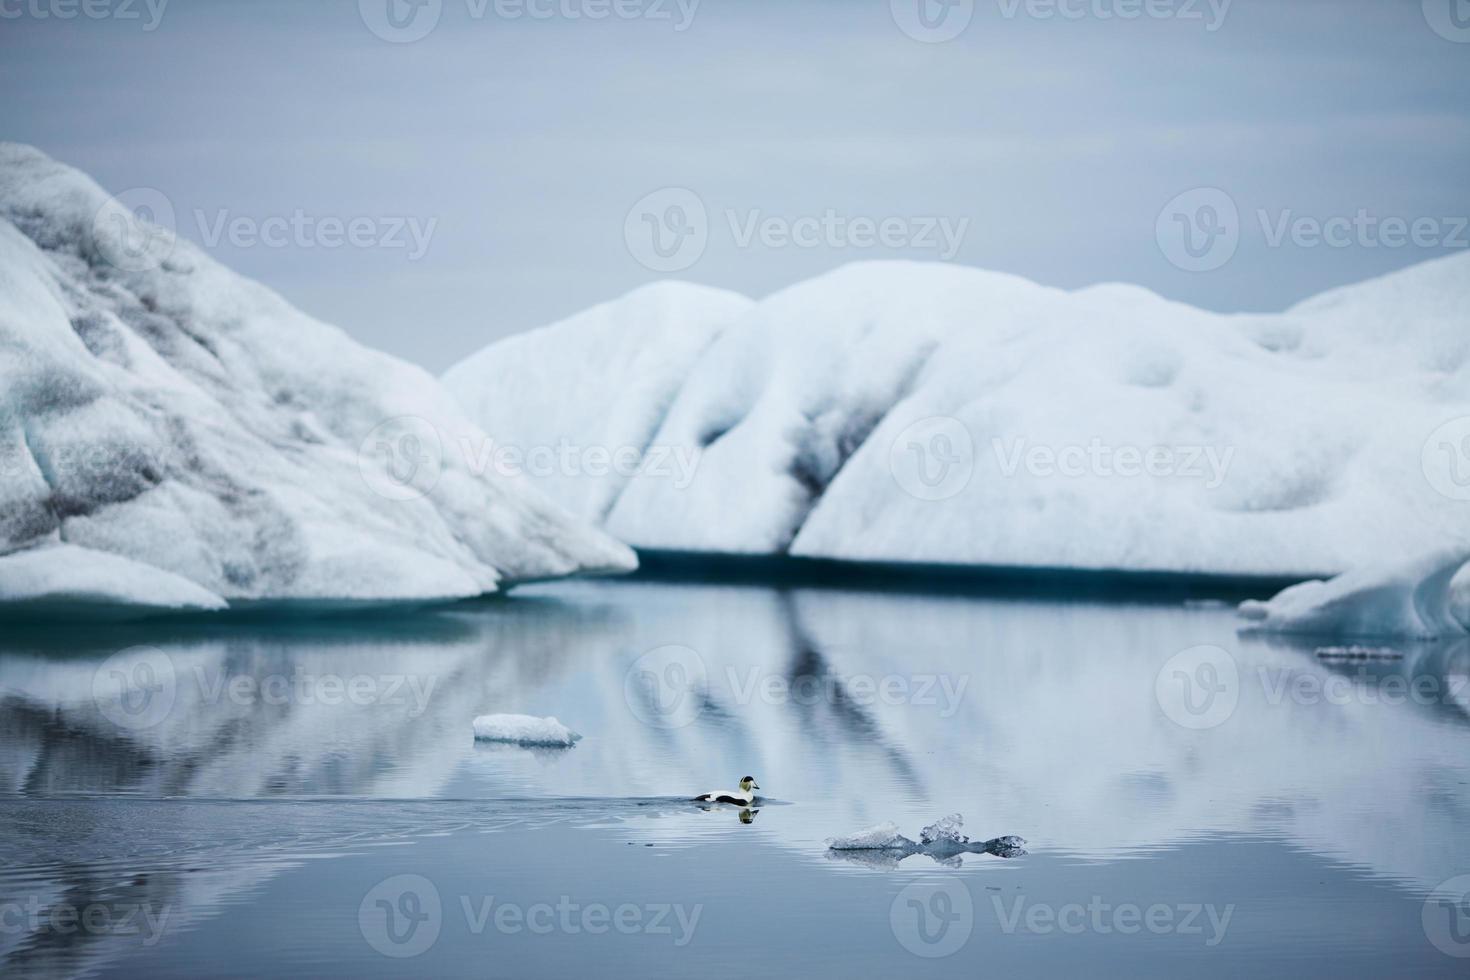 pato em icebergs cobertos de neve - lago glacial jokulsarlon, islândia foto